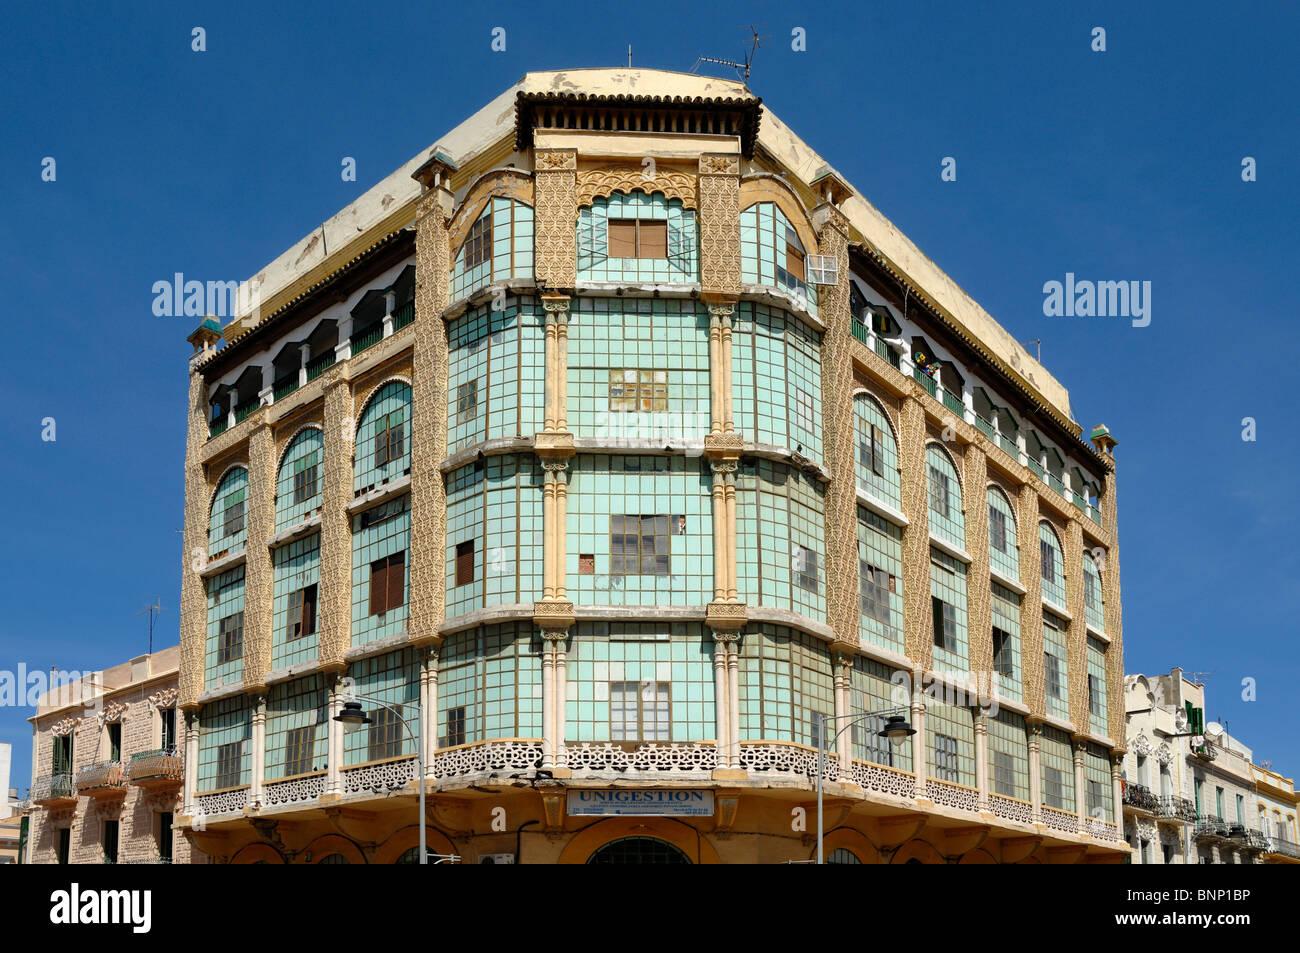 Casa de los Cristales, the Glass House (1922-1925), neo-Arab building planned as Queen Victoria Hotel, Melilla, - Stock Image